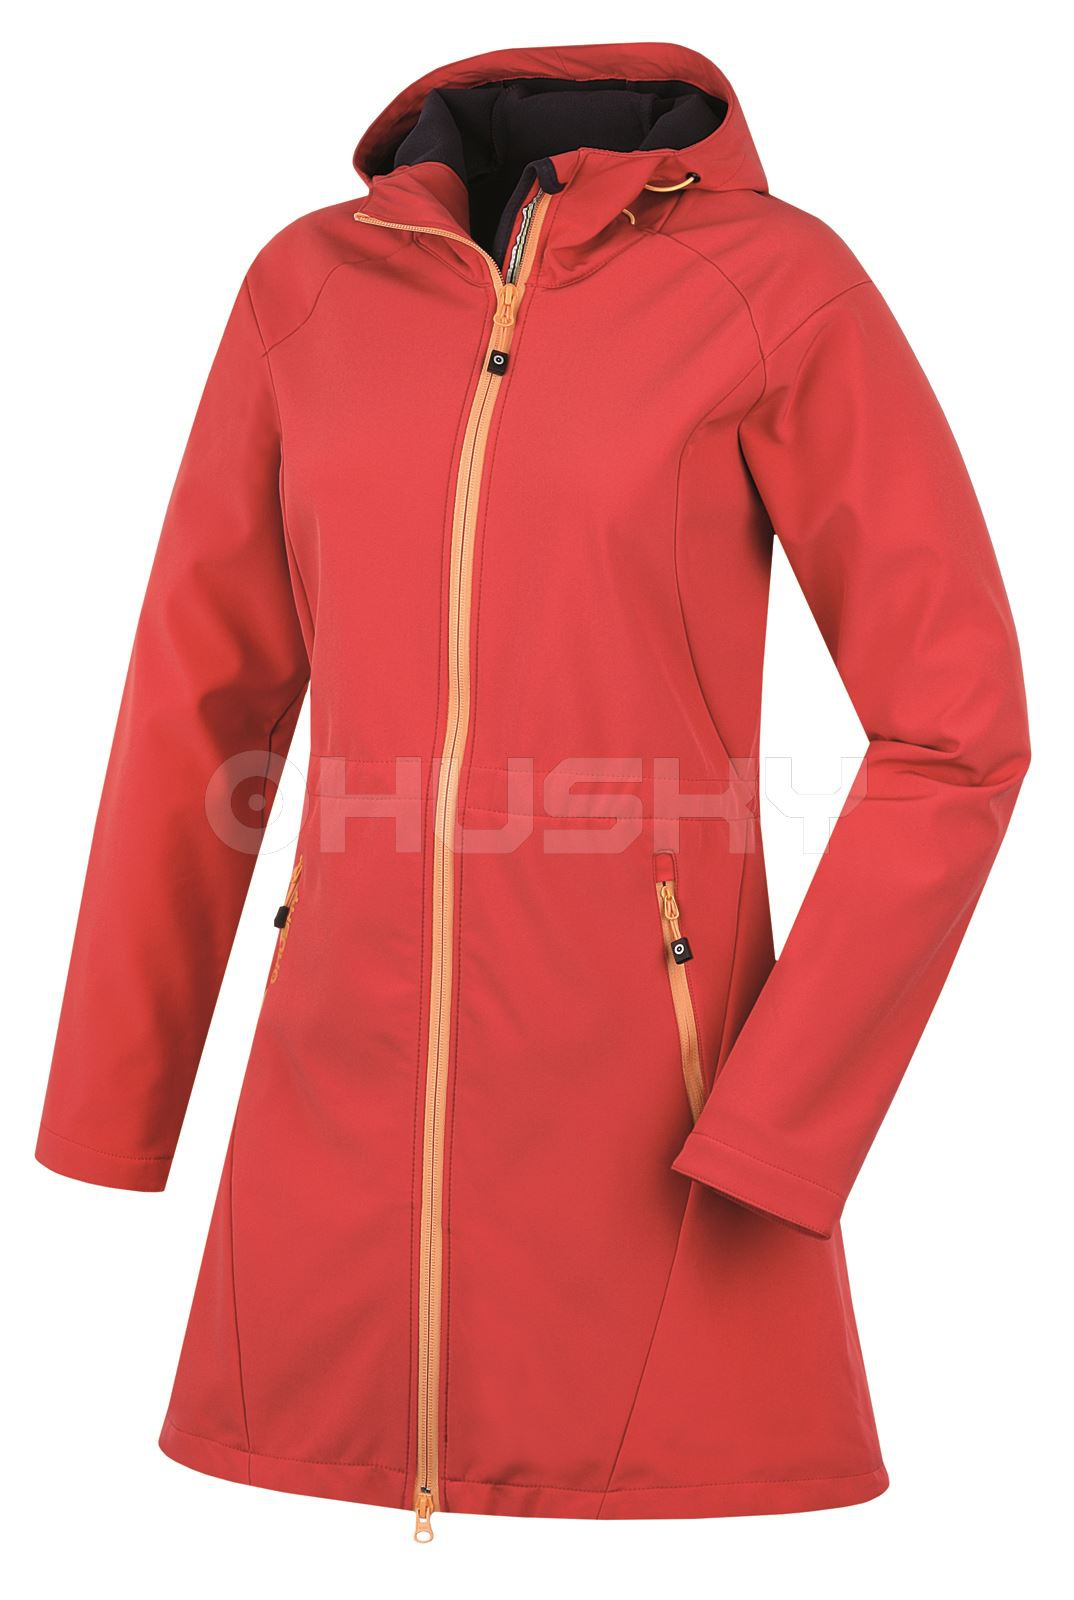 Husky Dámský softshellový kabátek Sara červená Velikost: M